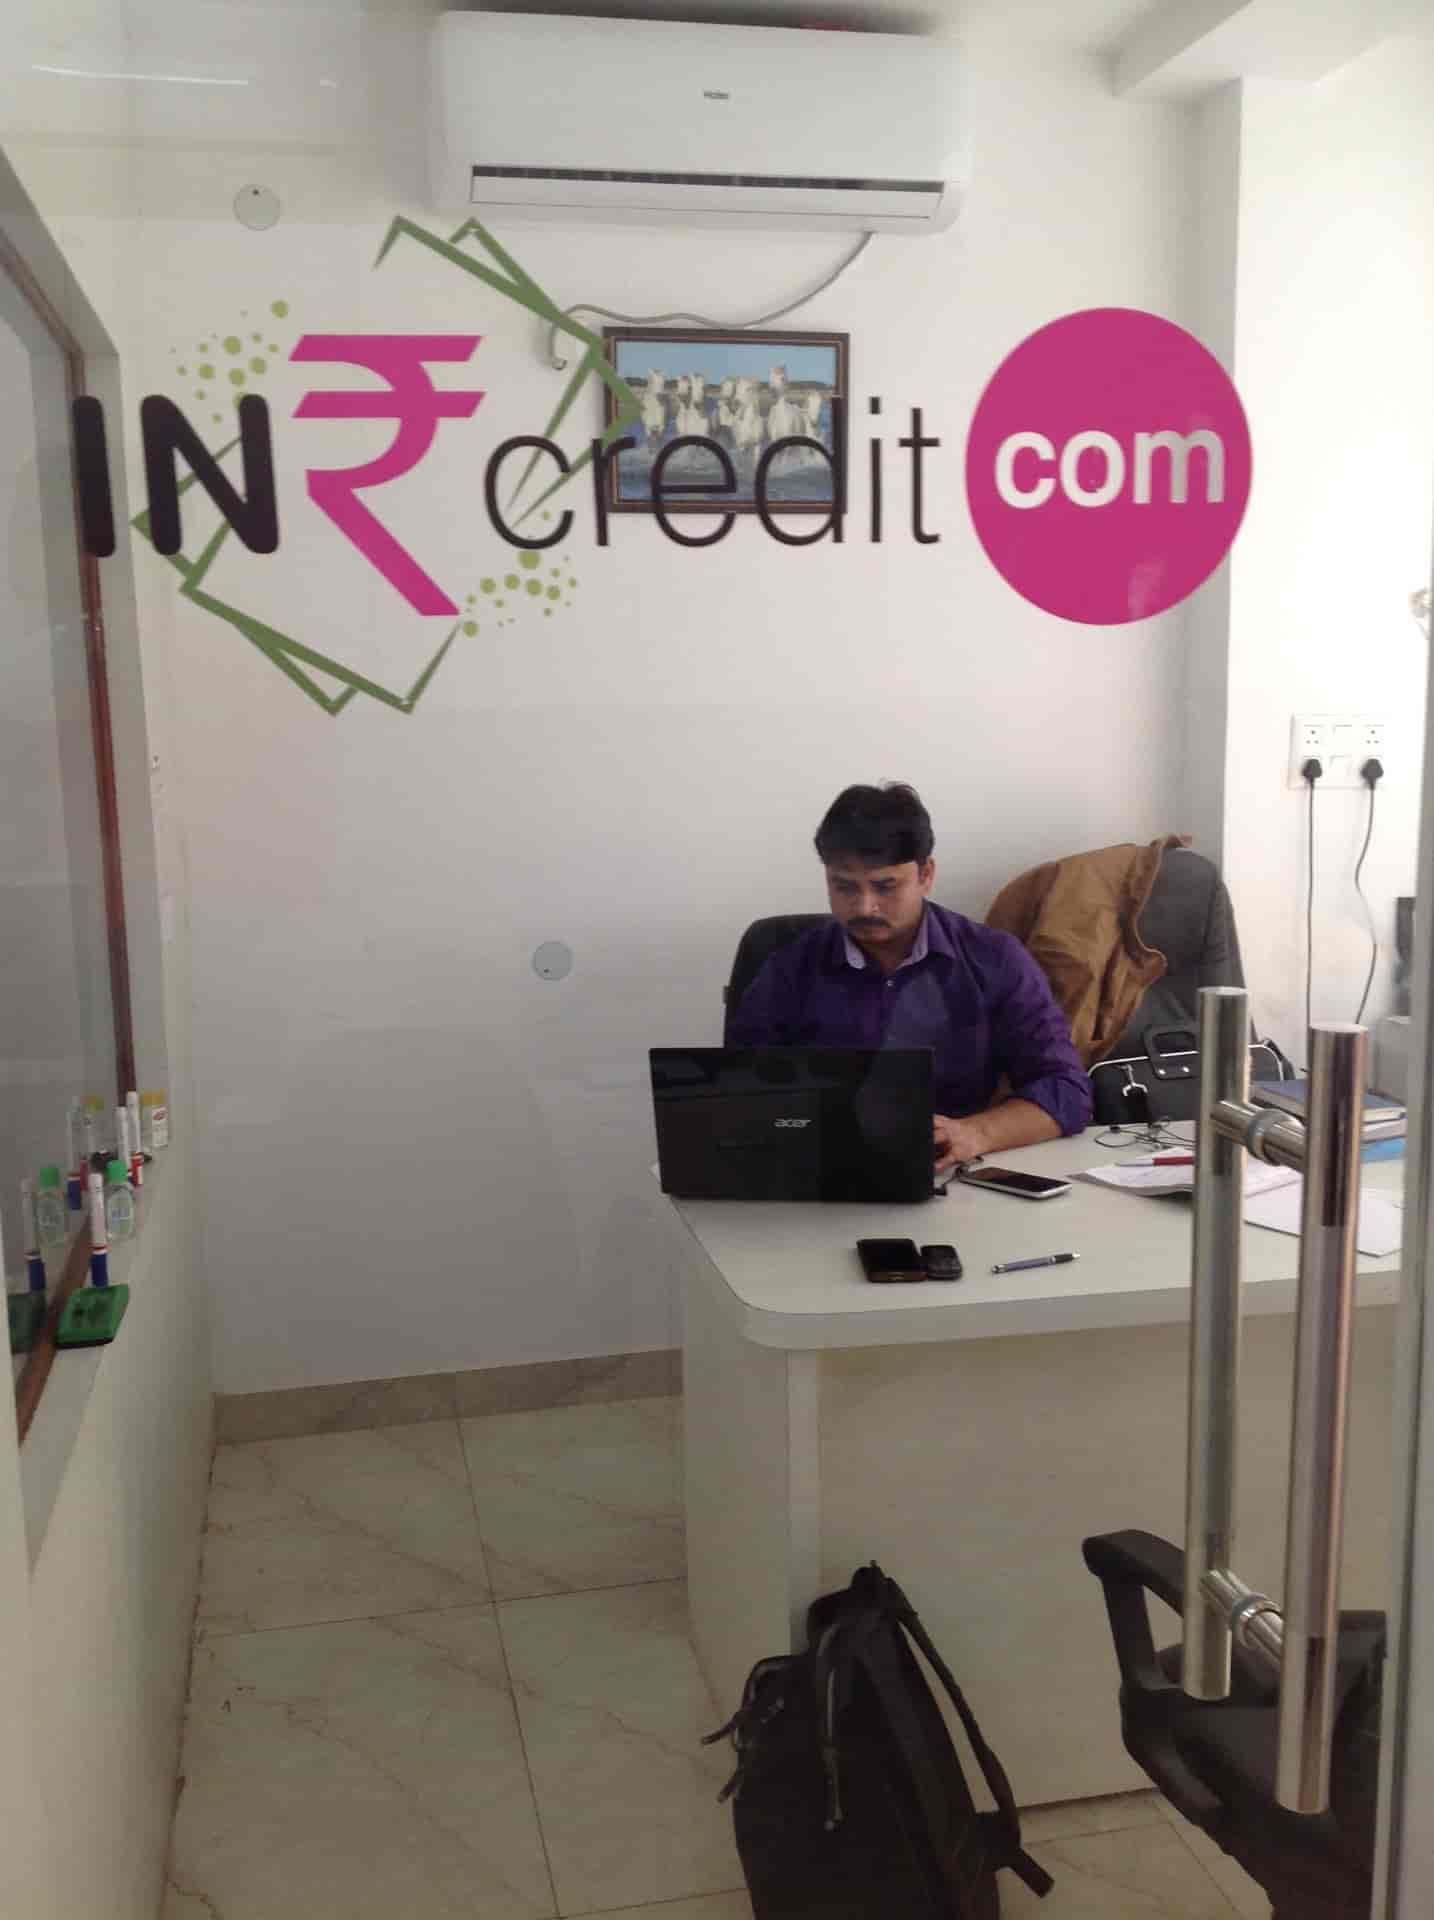 5874bd7c2219 INR Credit